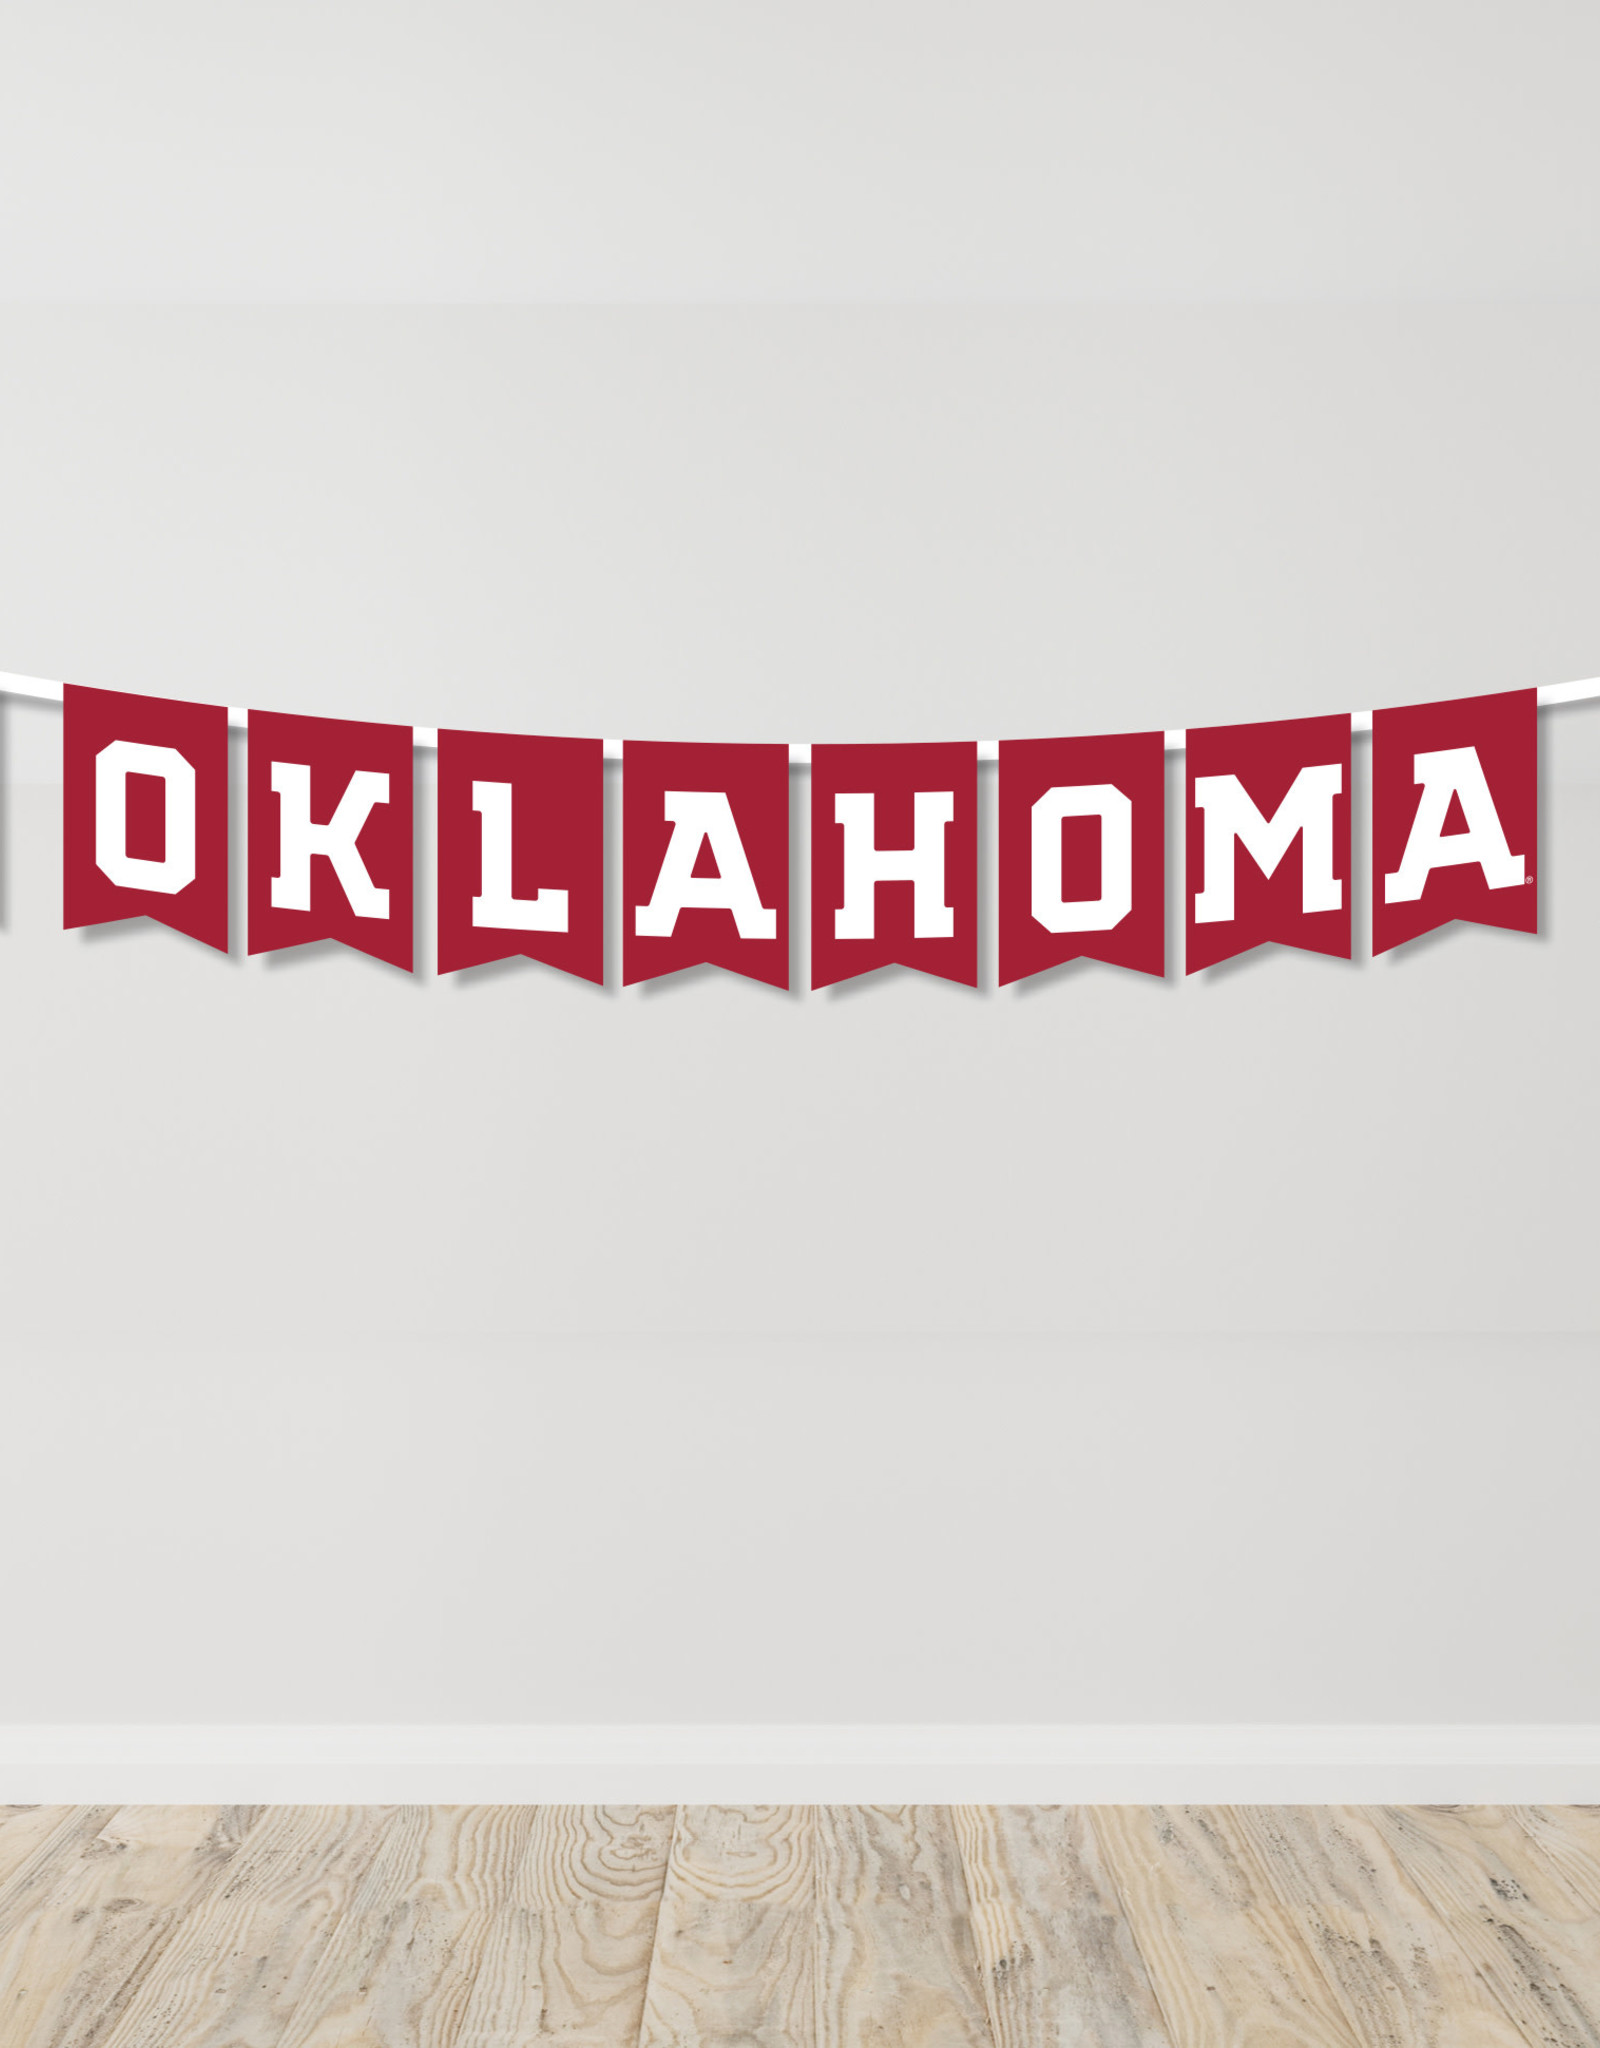 UBF Oklahoma Banner String